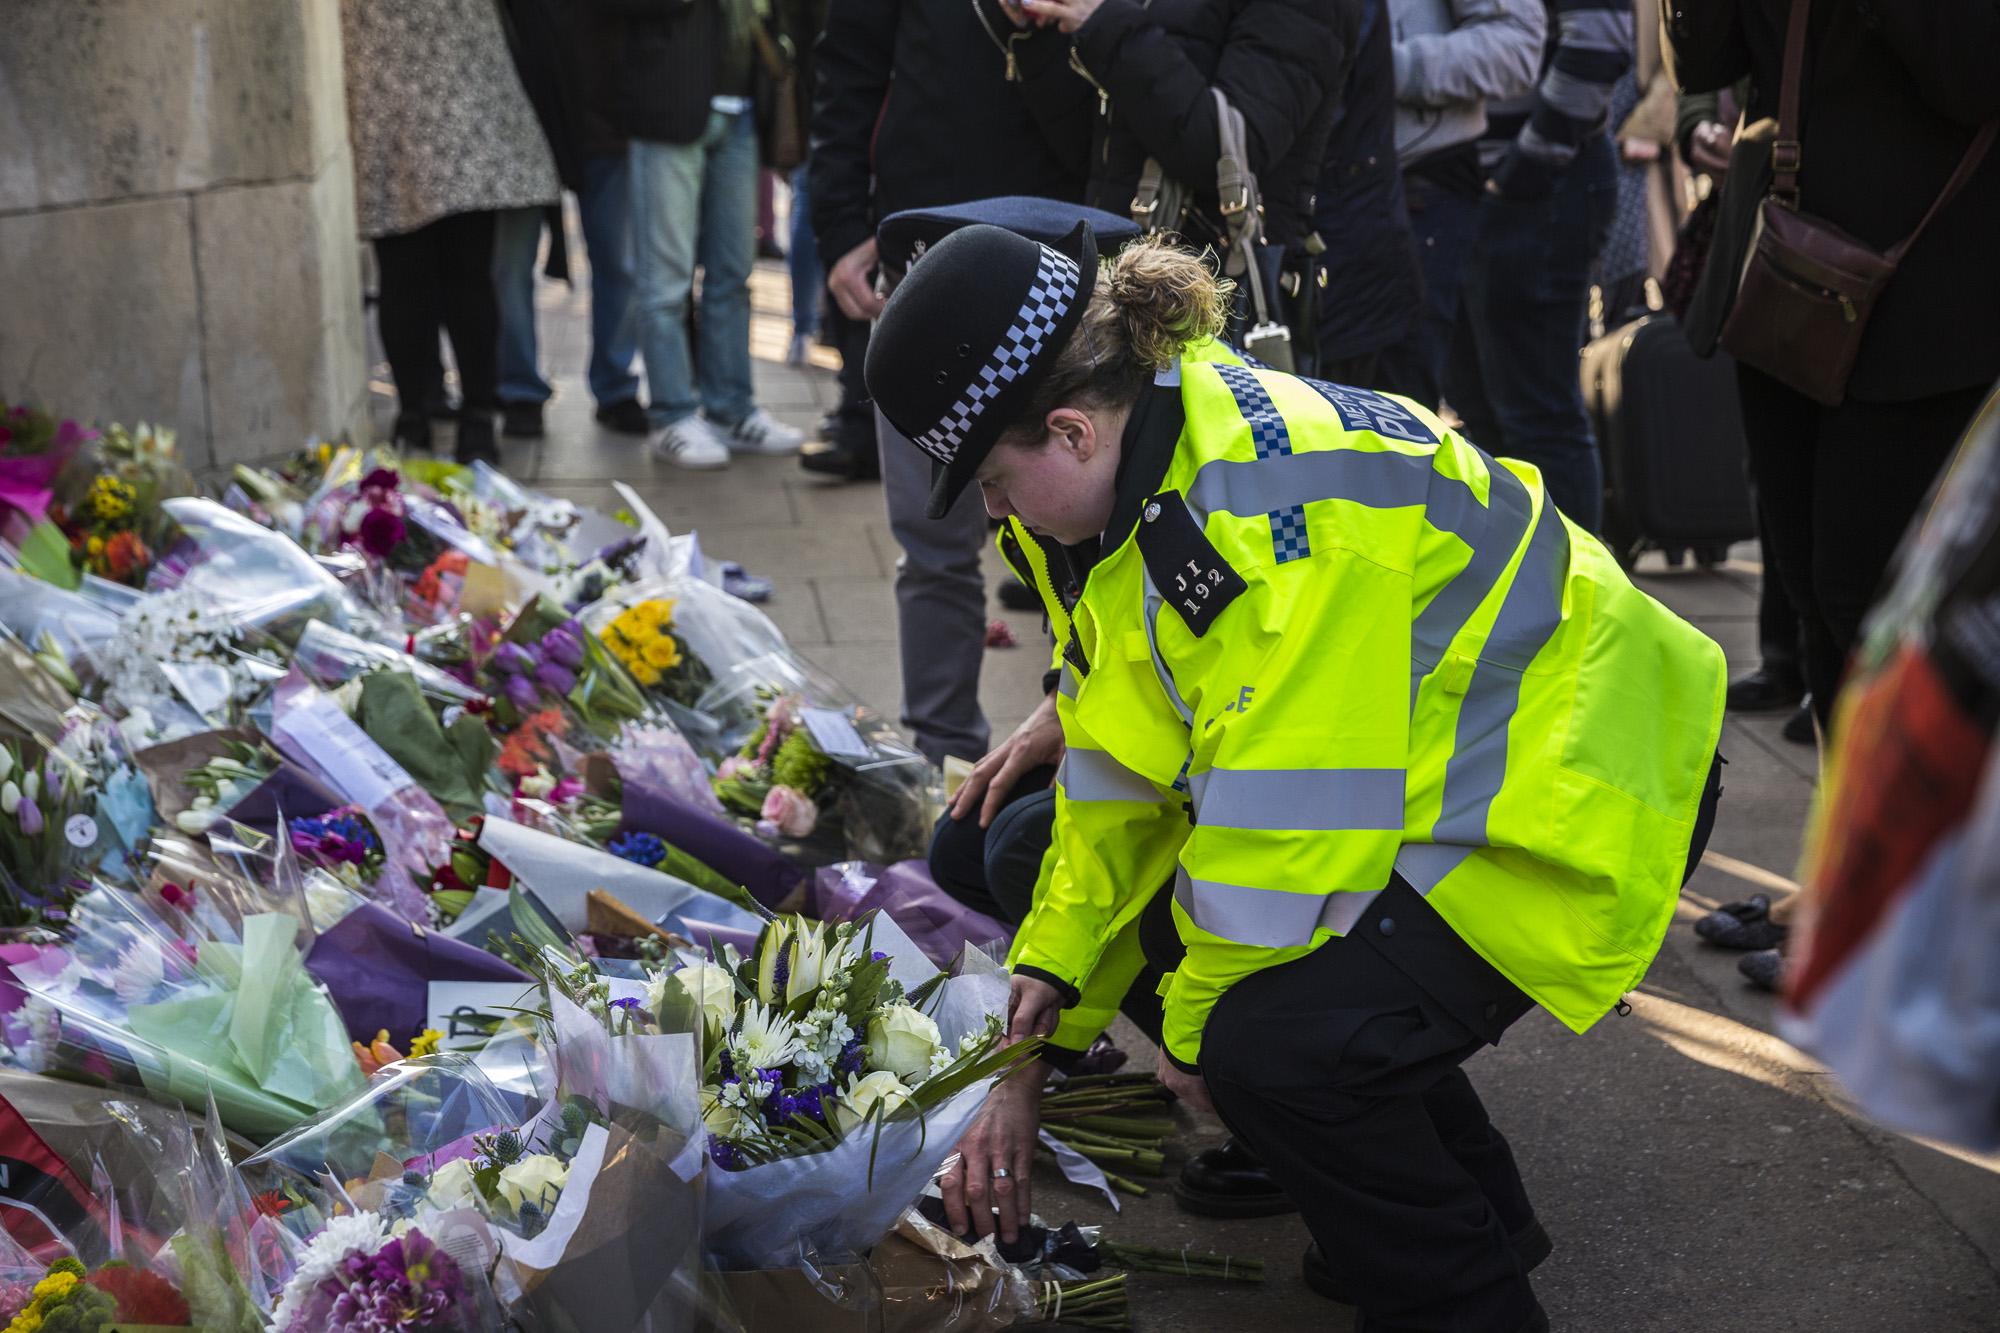 London_Attack_Hope_Not_Hate-22.jpg